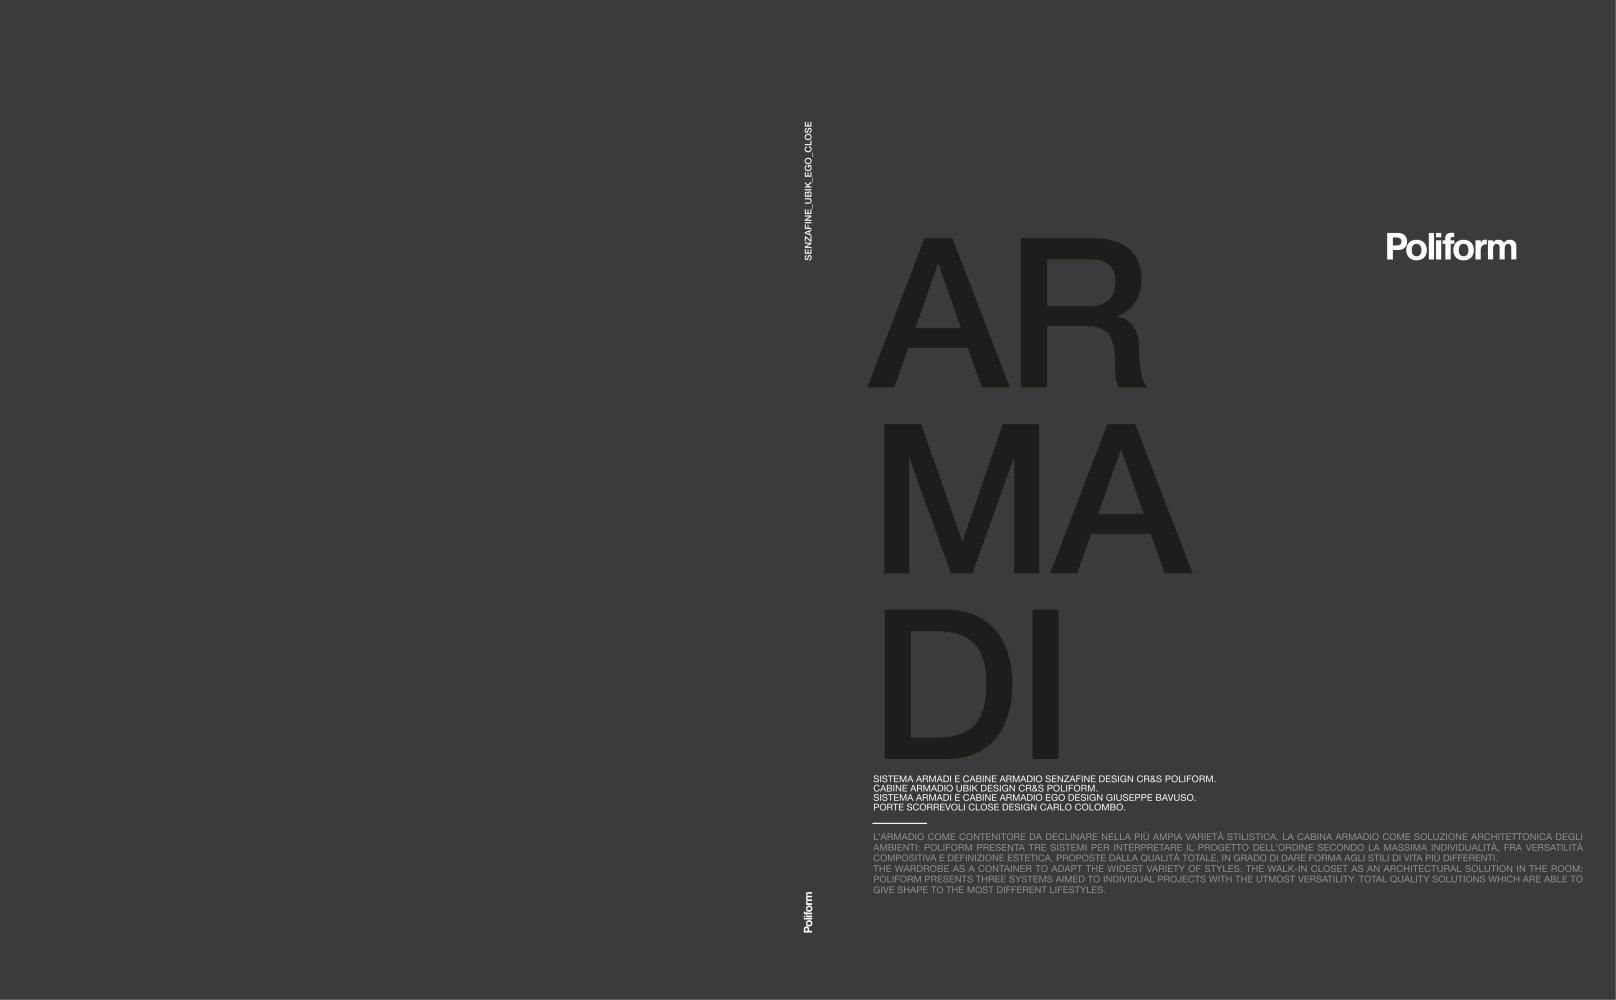 Cabina Armadio Ego Poliform : Wardrobes poliform pdf catalogues documentation brochures